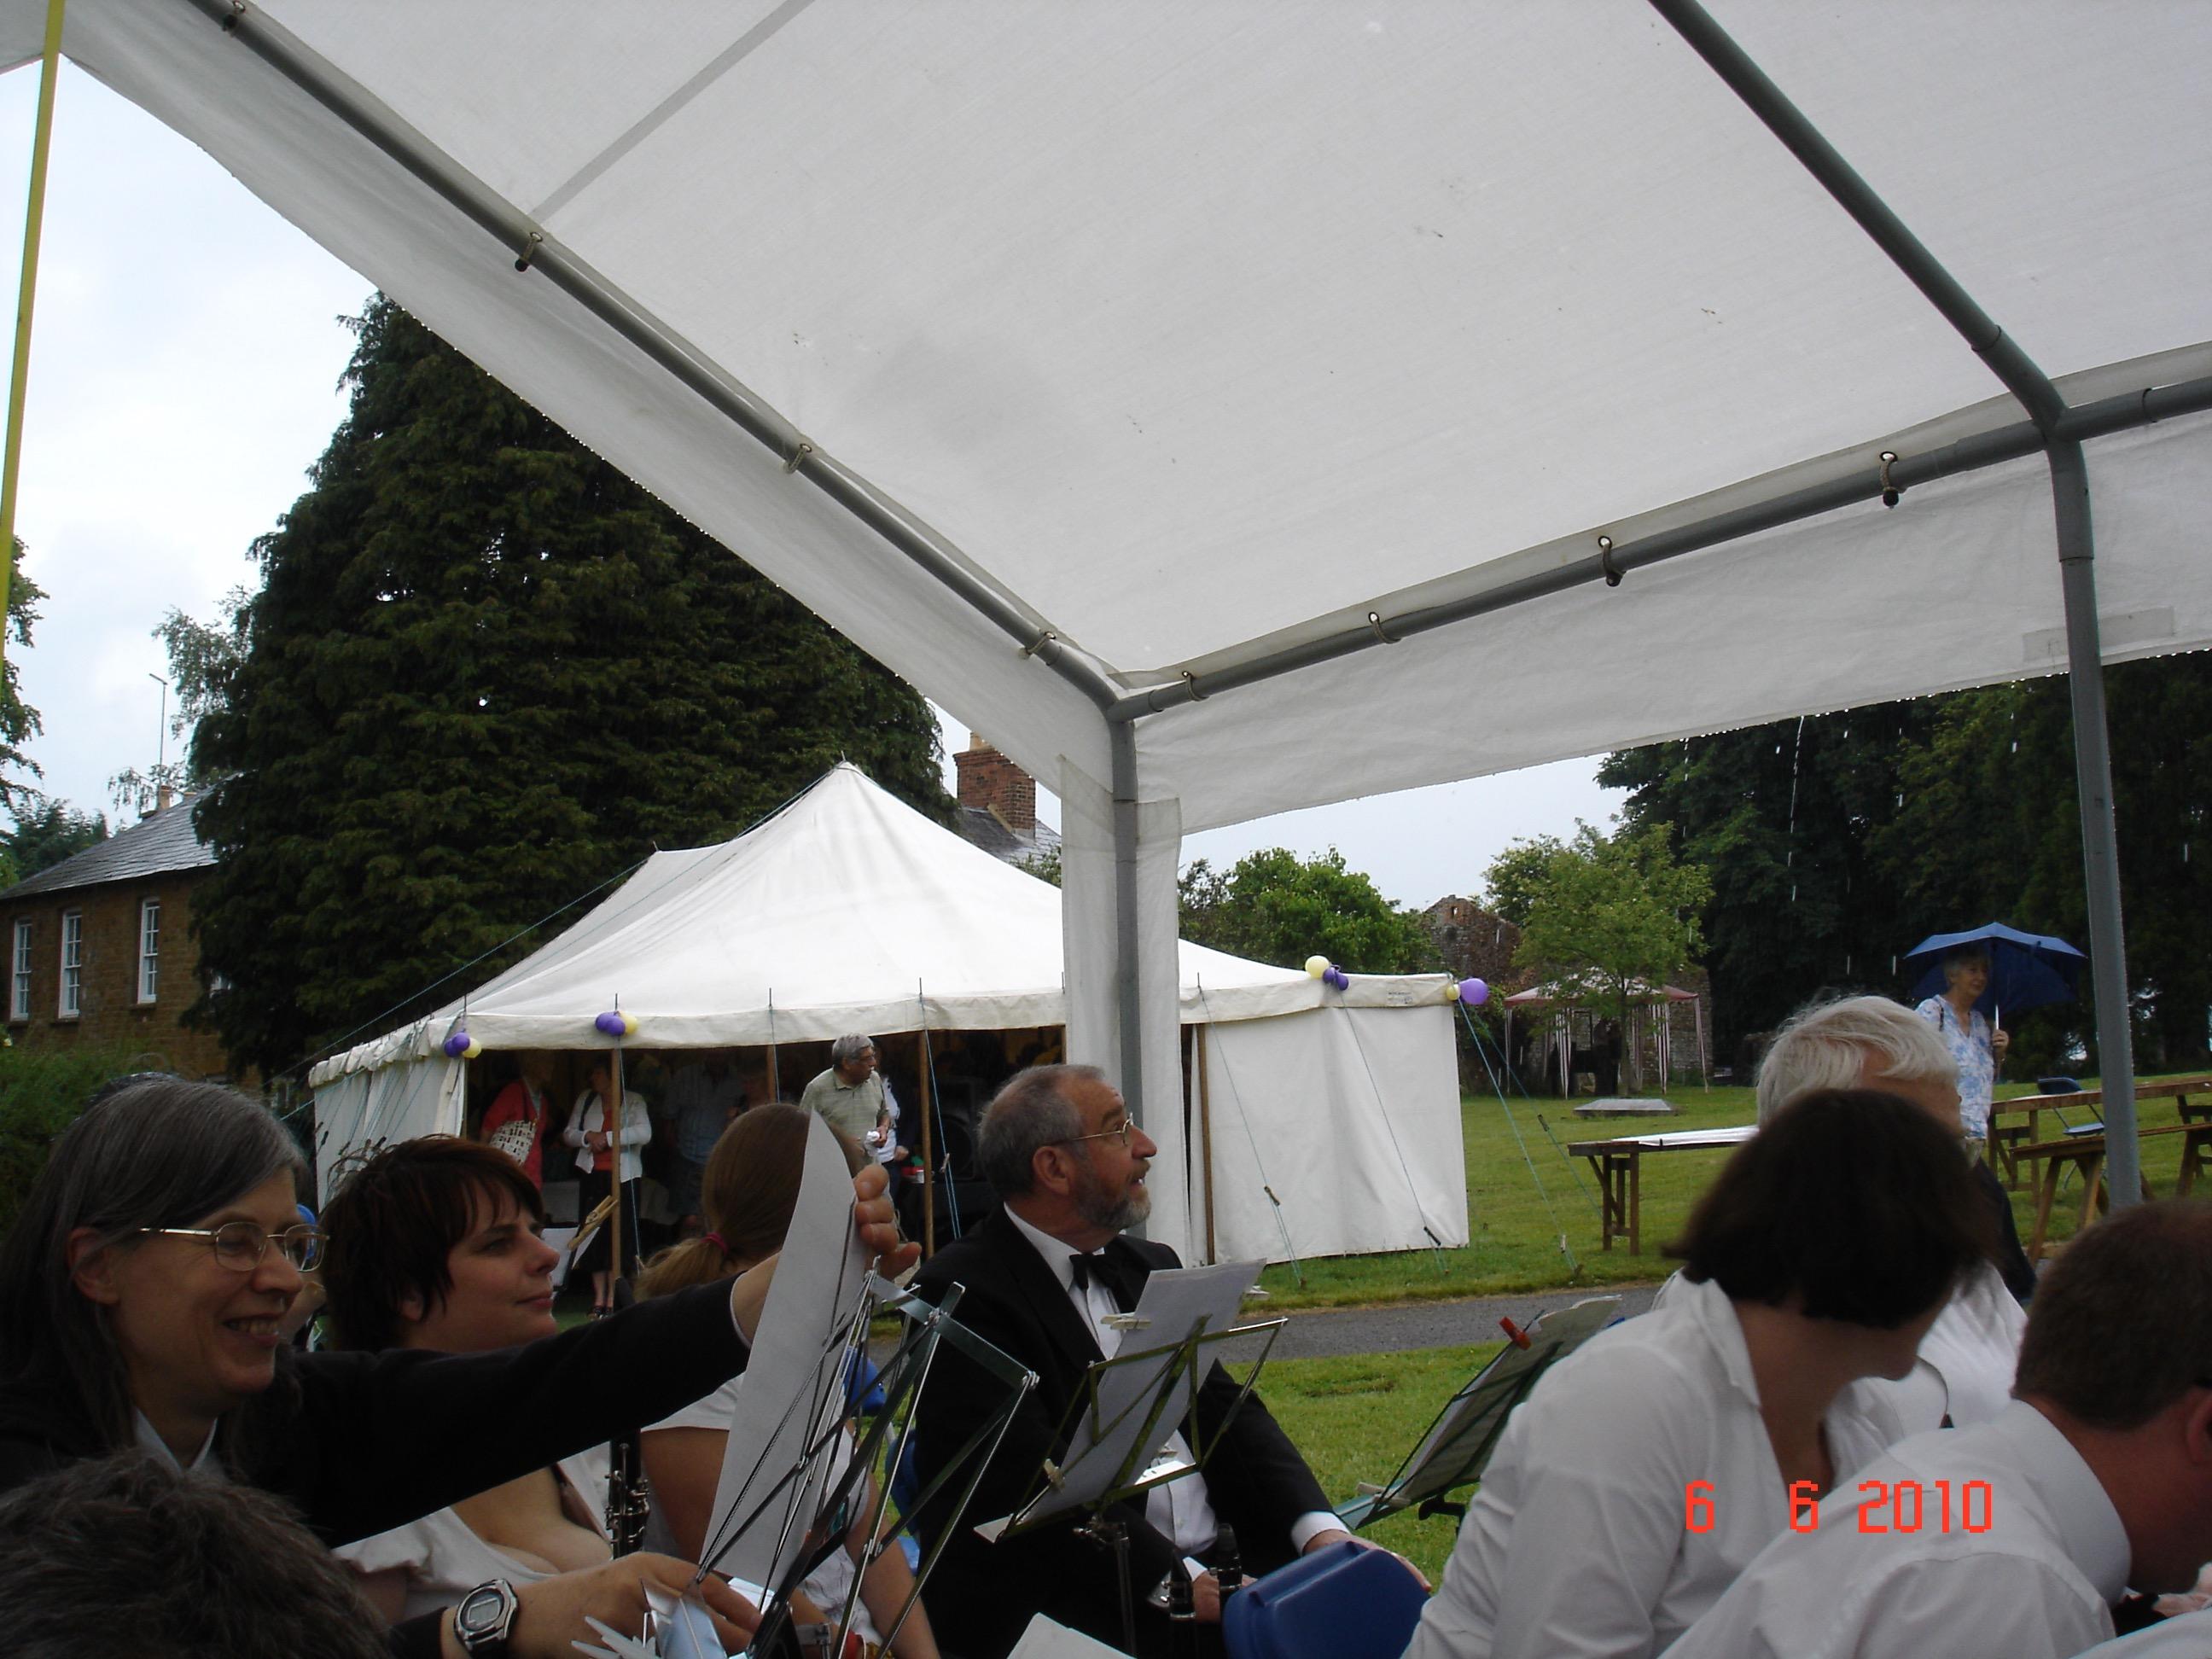 Brixworth 2010